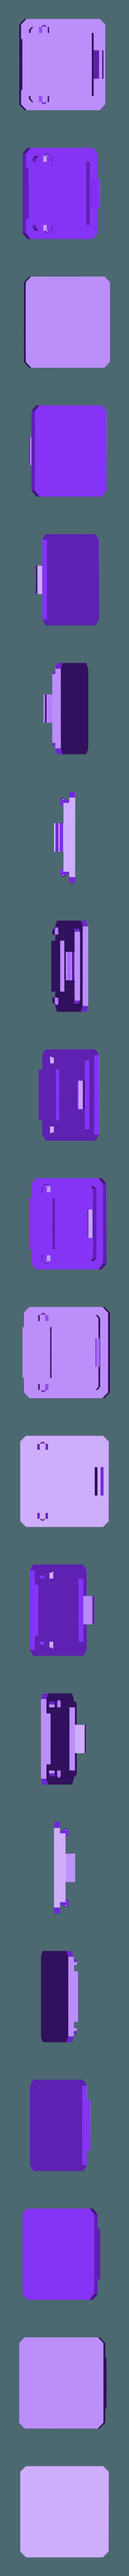 enclosure_back.stl Download free STL file Anycubic I3 Mega Raspberry Pi Camera Mount - Remix • Design to 3D print, nik101968